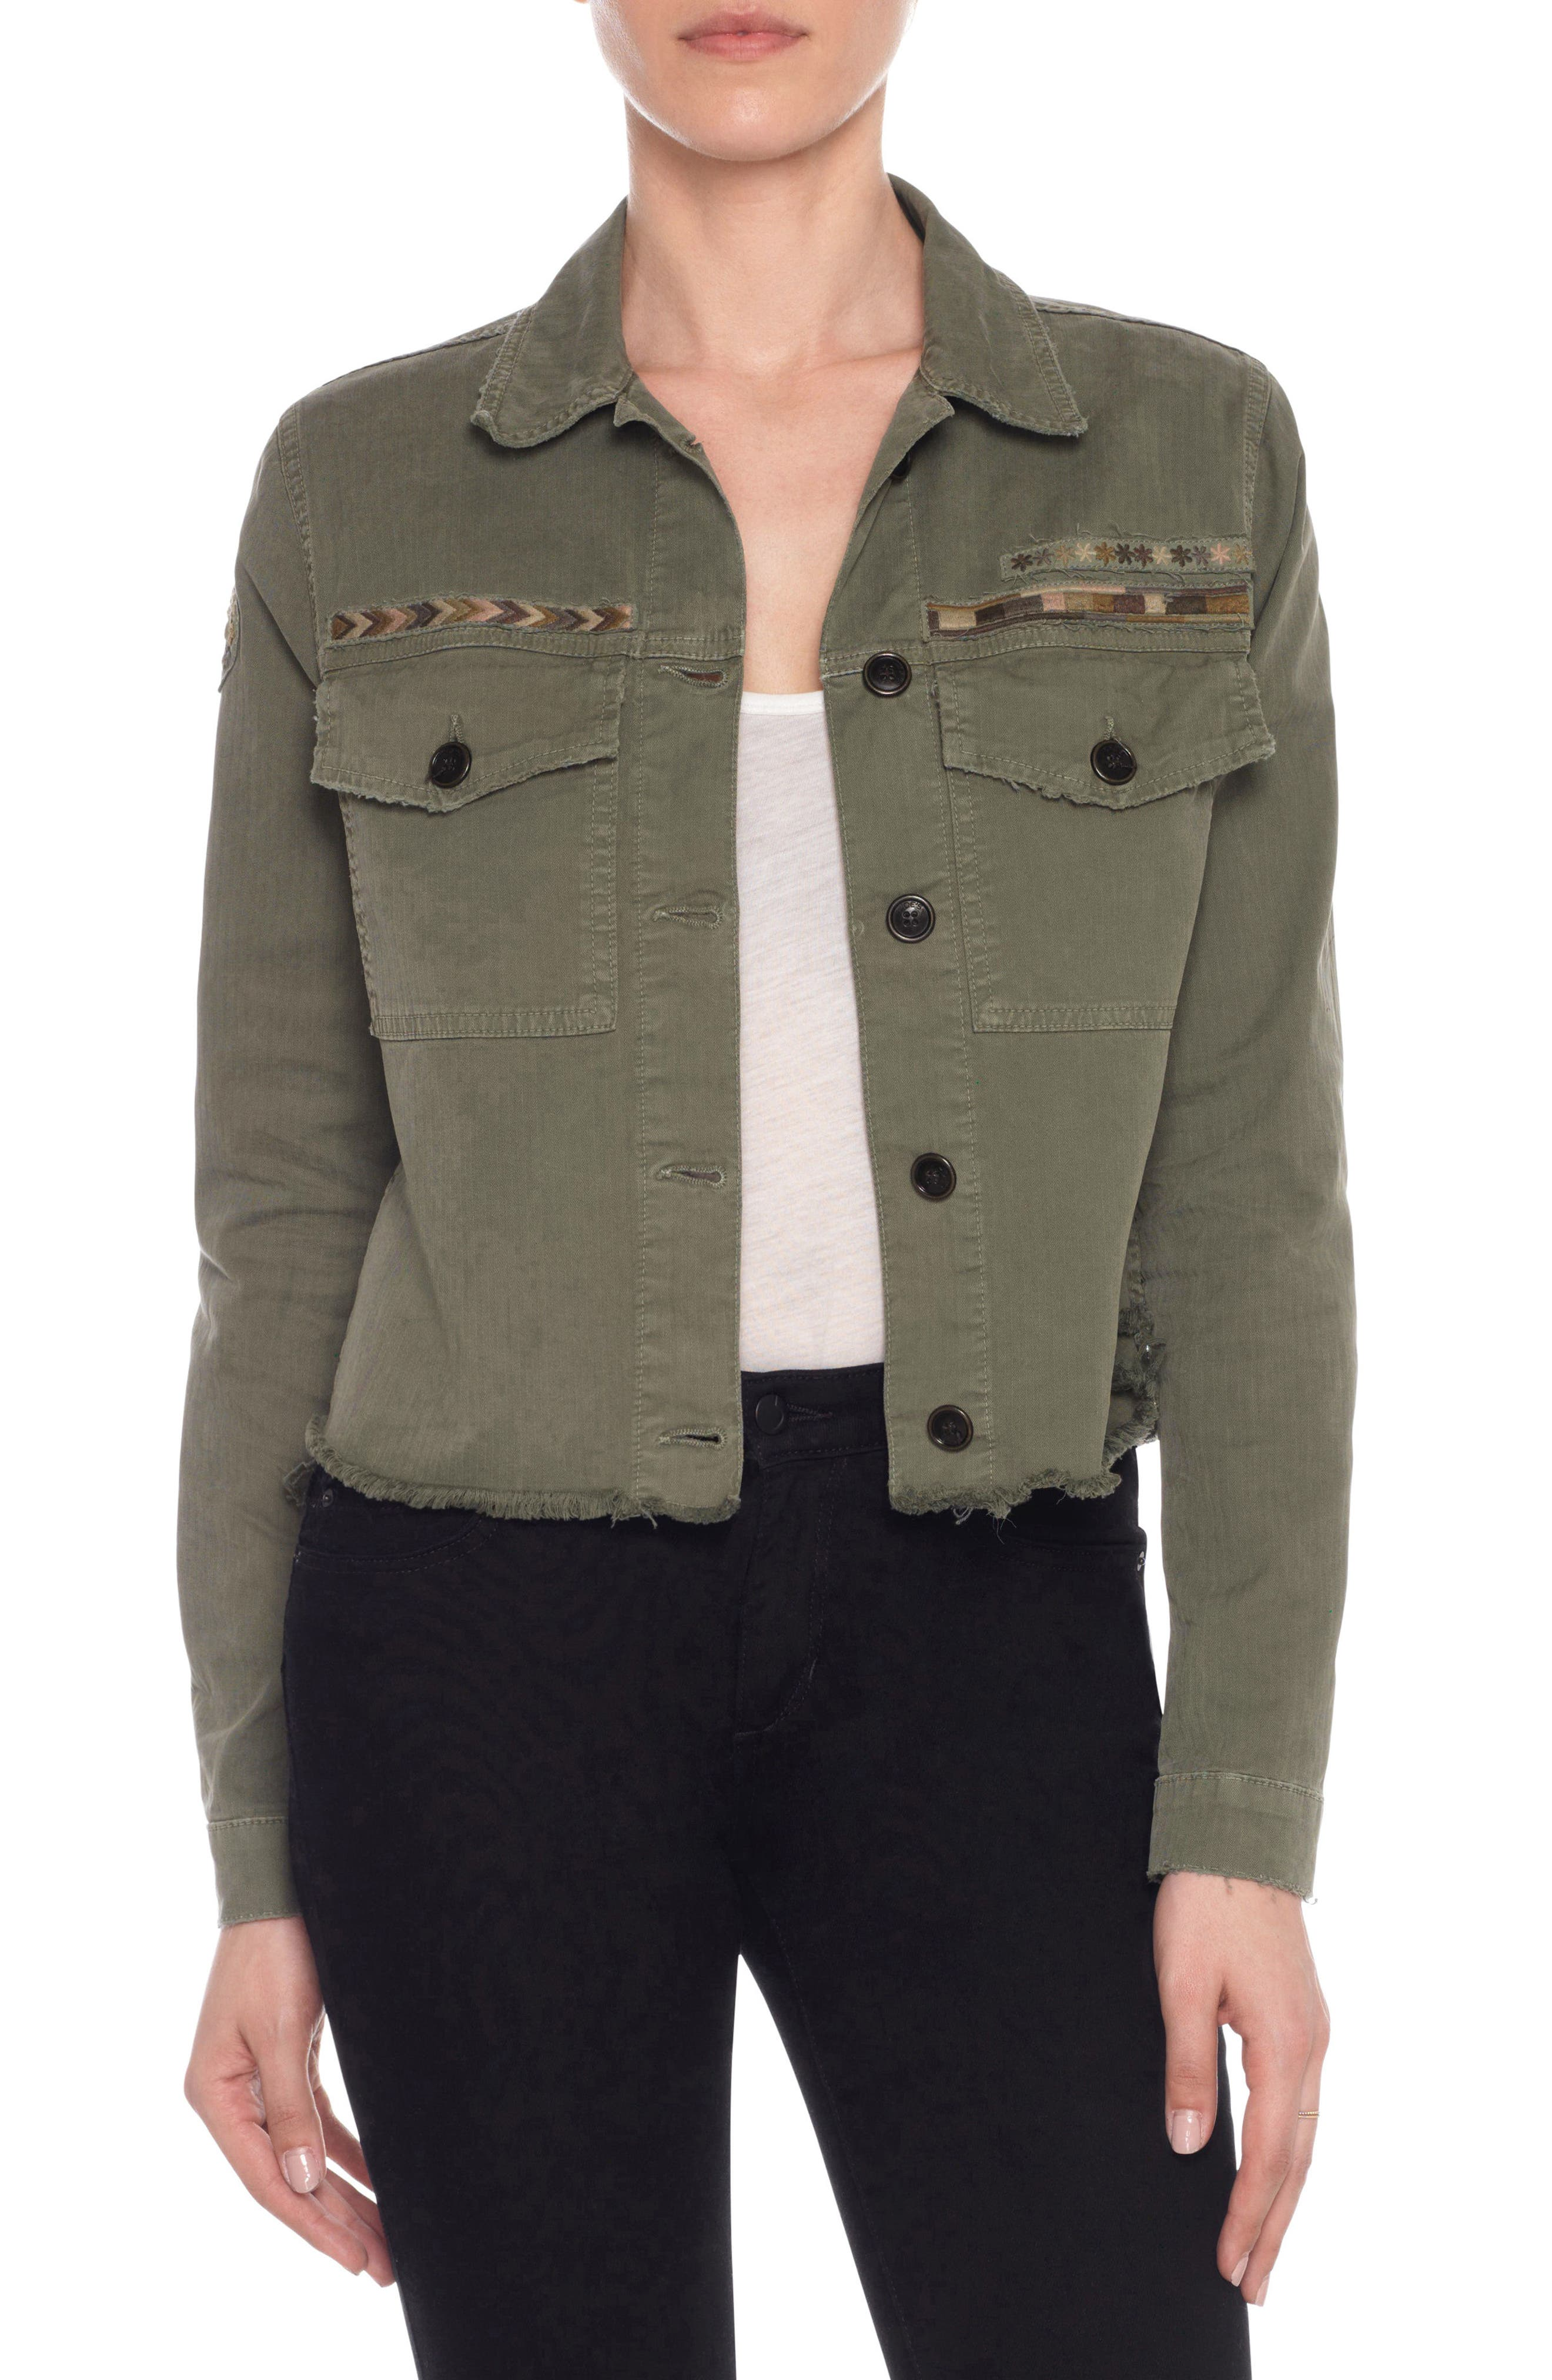 Joe's Frayed Crop Denim Flight Jacket